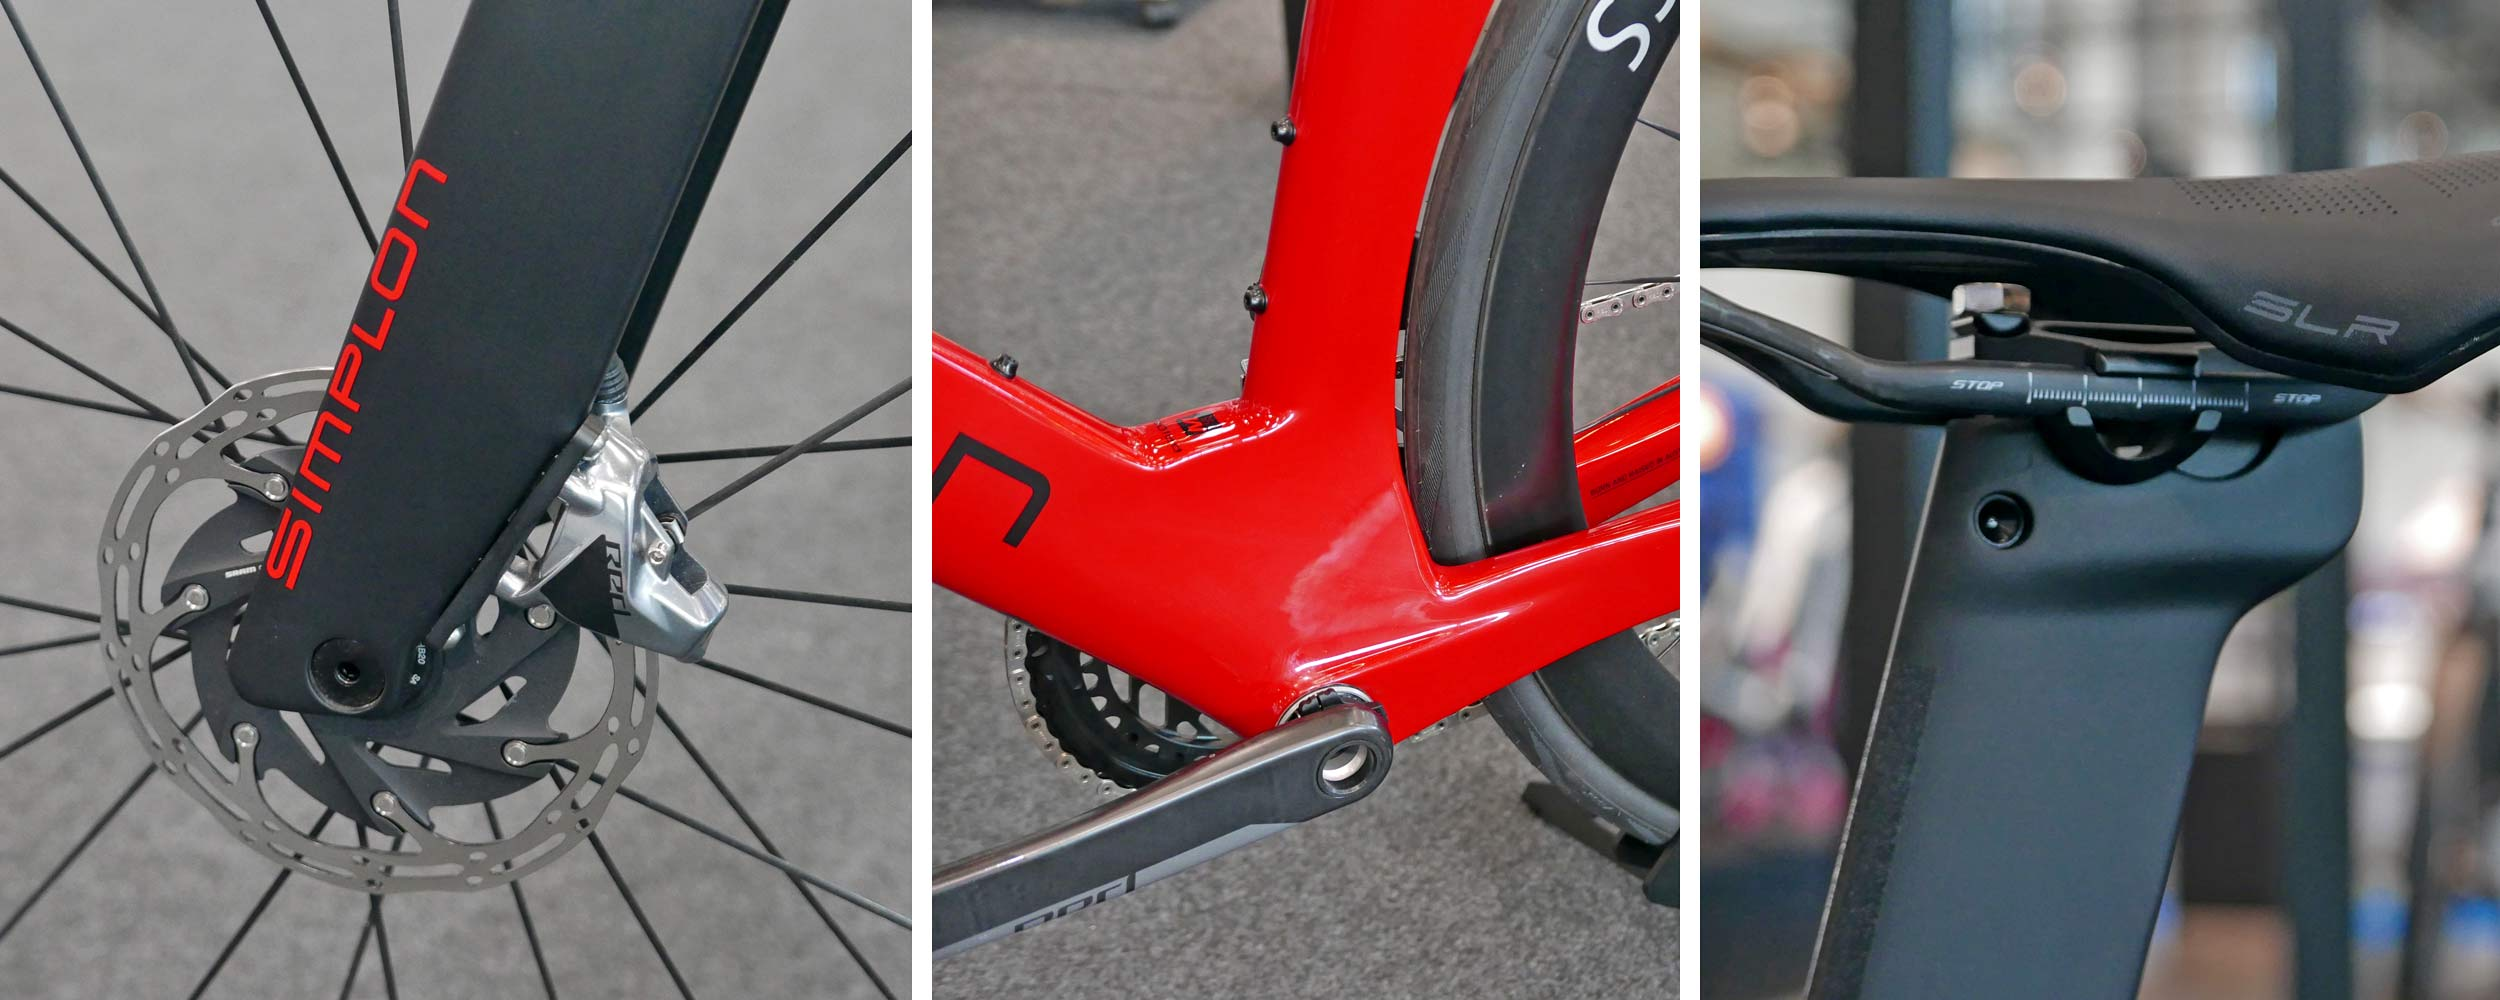 Simplon Pride II disc brake carbon aero road bike,details